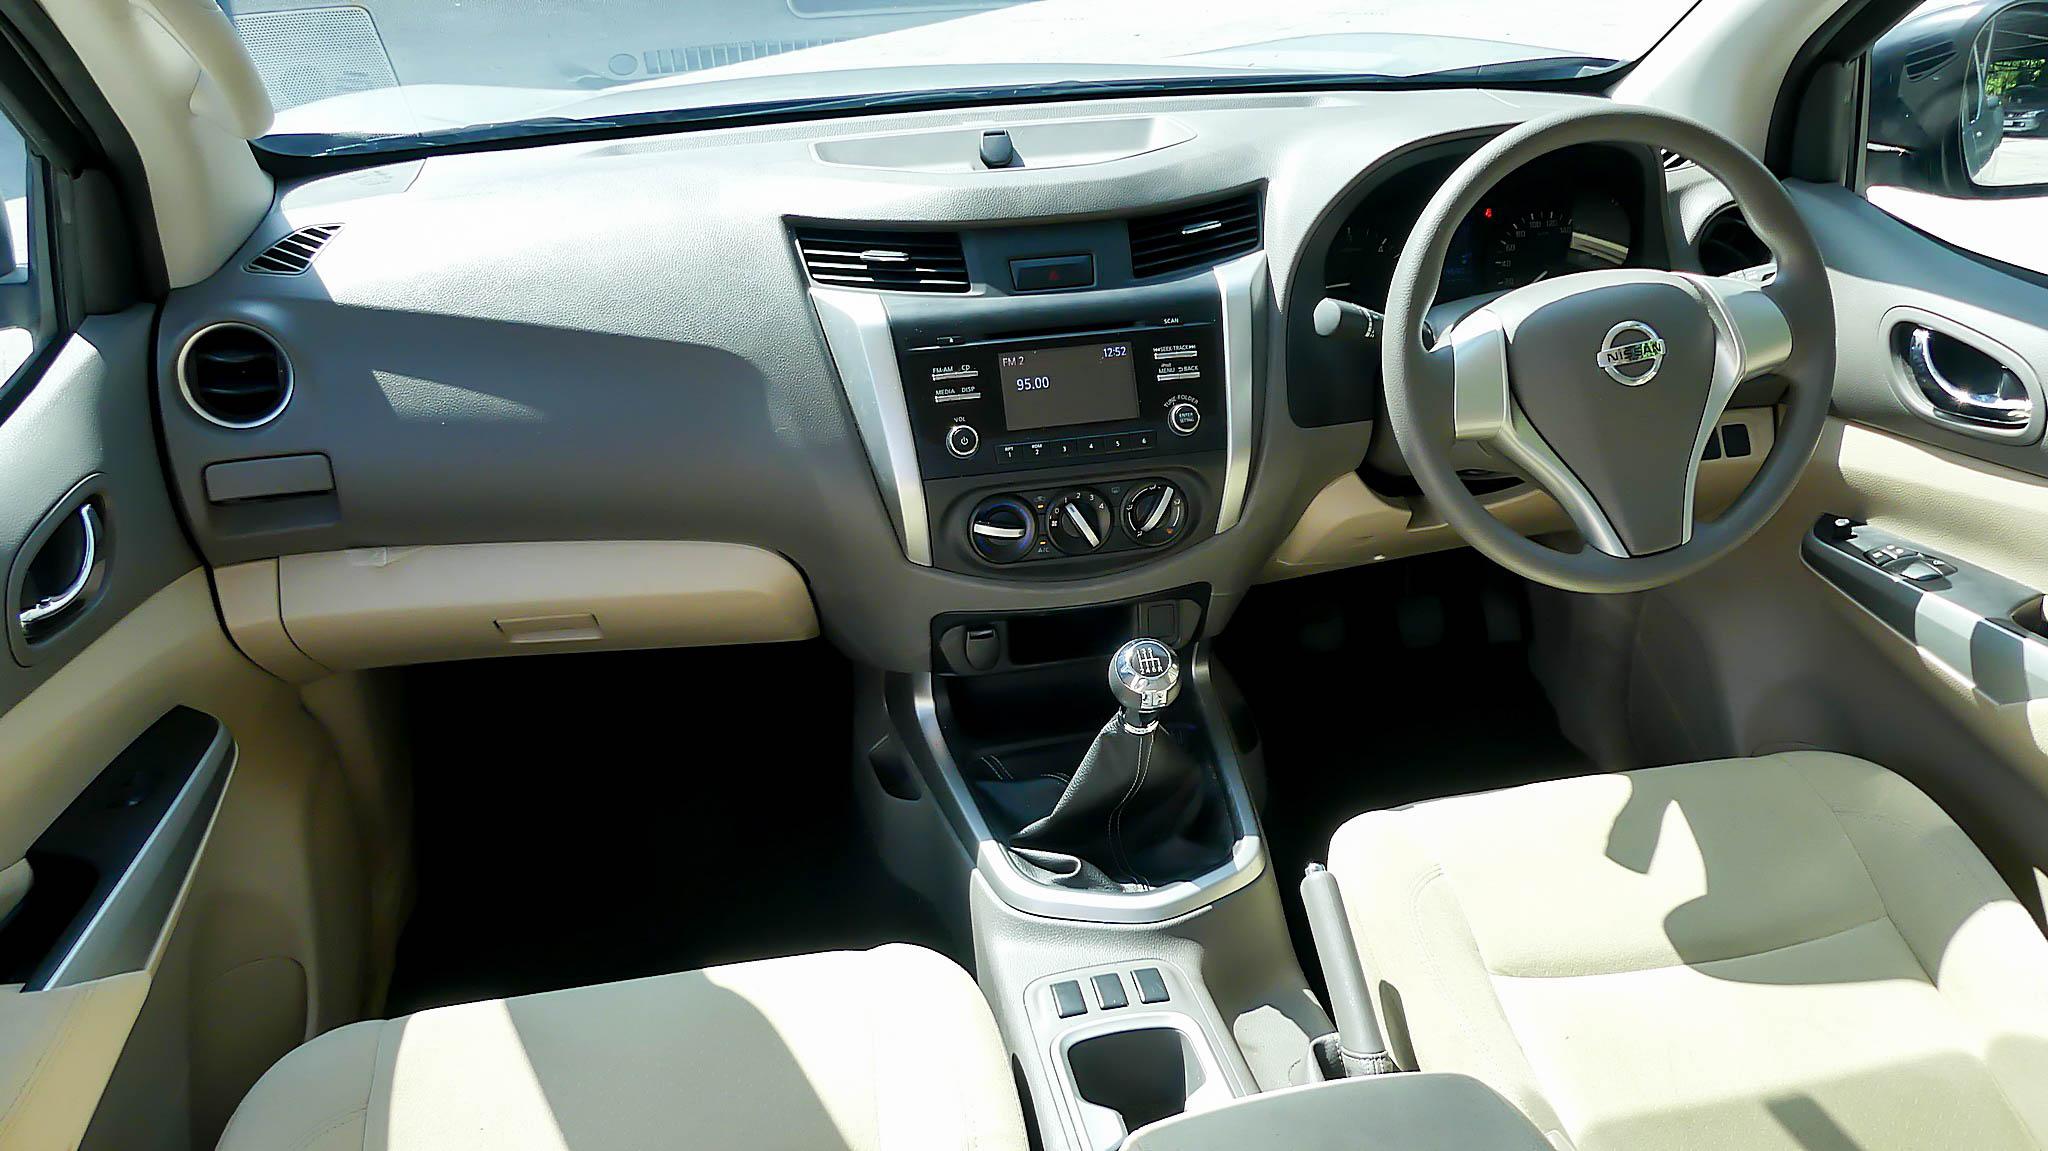 Nissan Navara NP300 2.5 E / MT ปี 2019